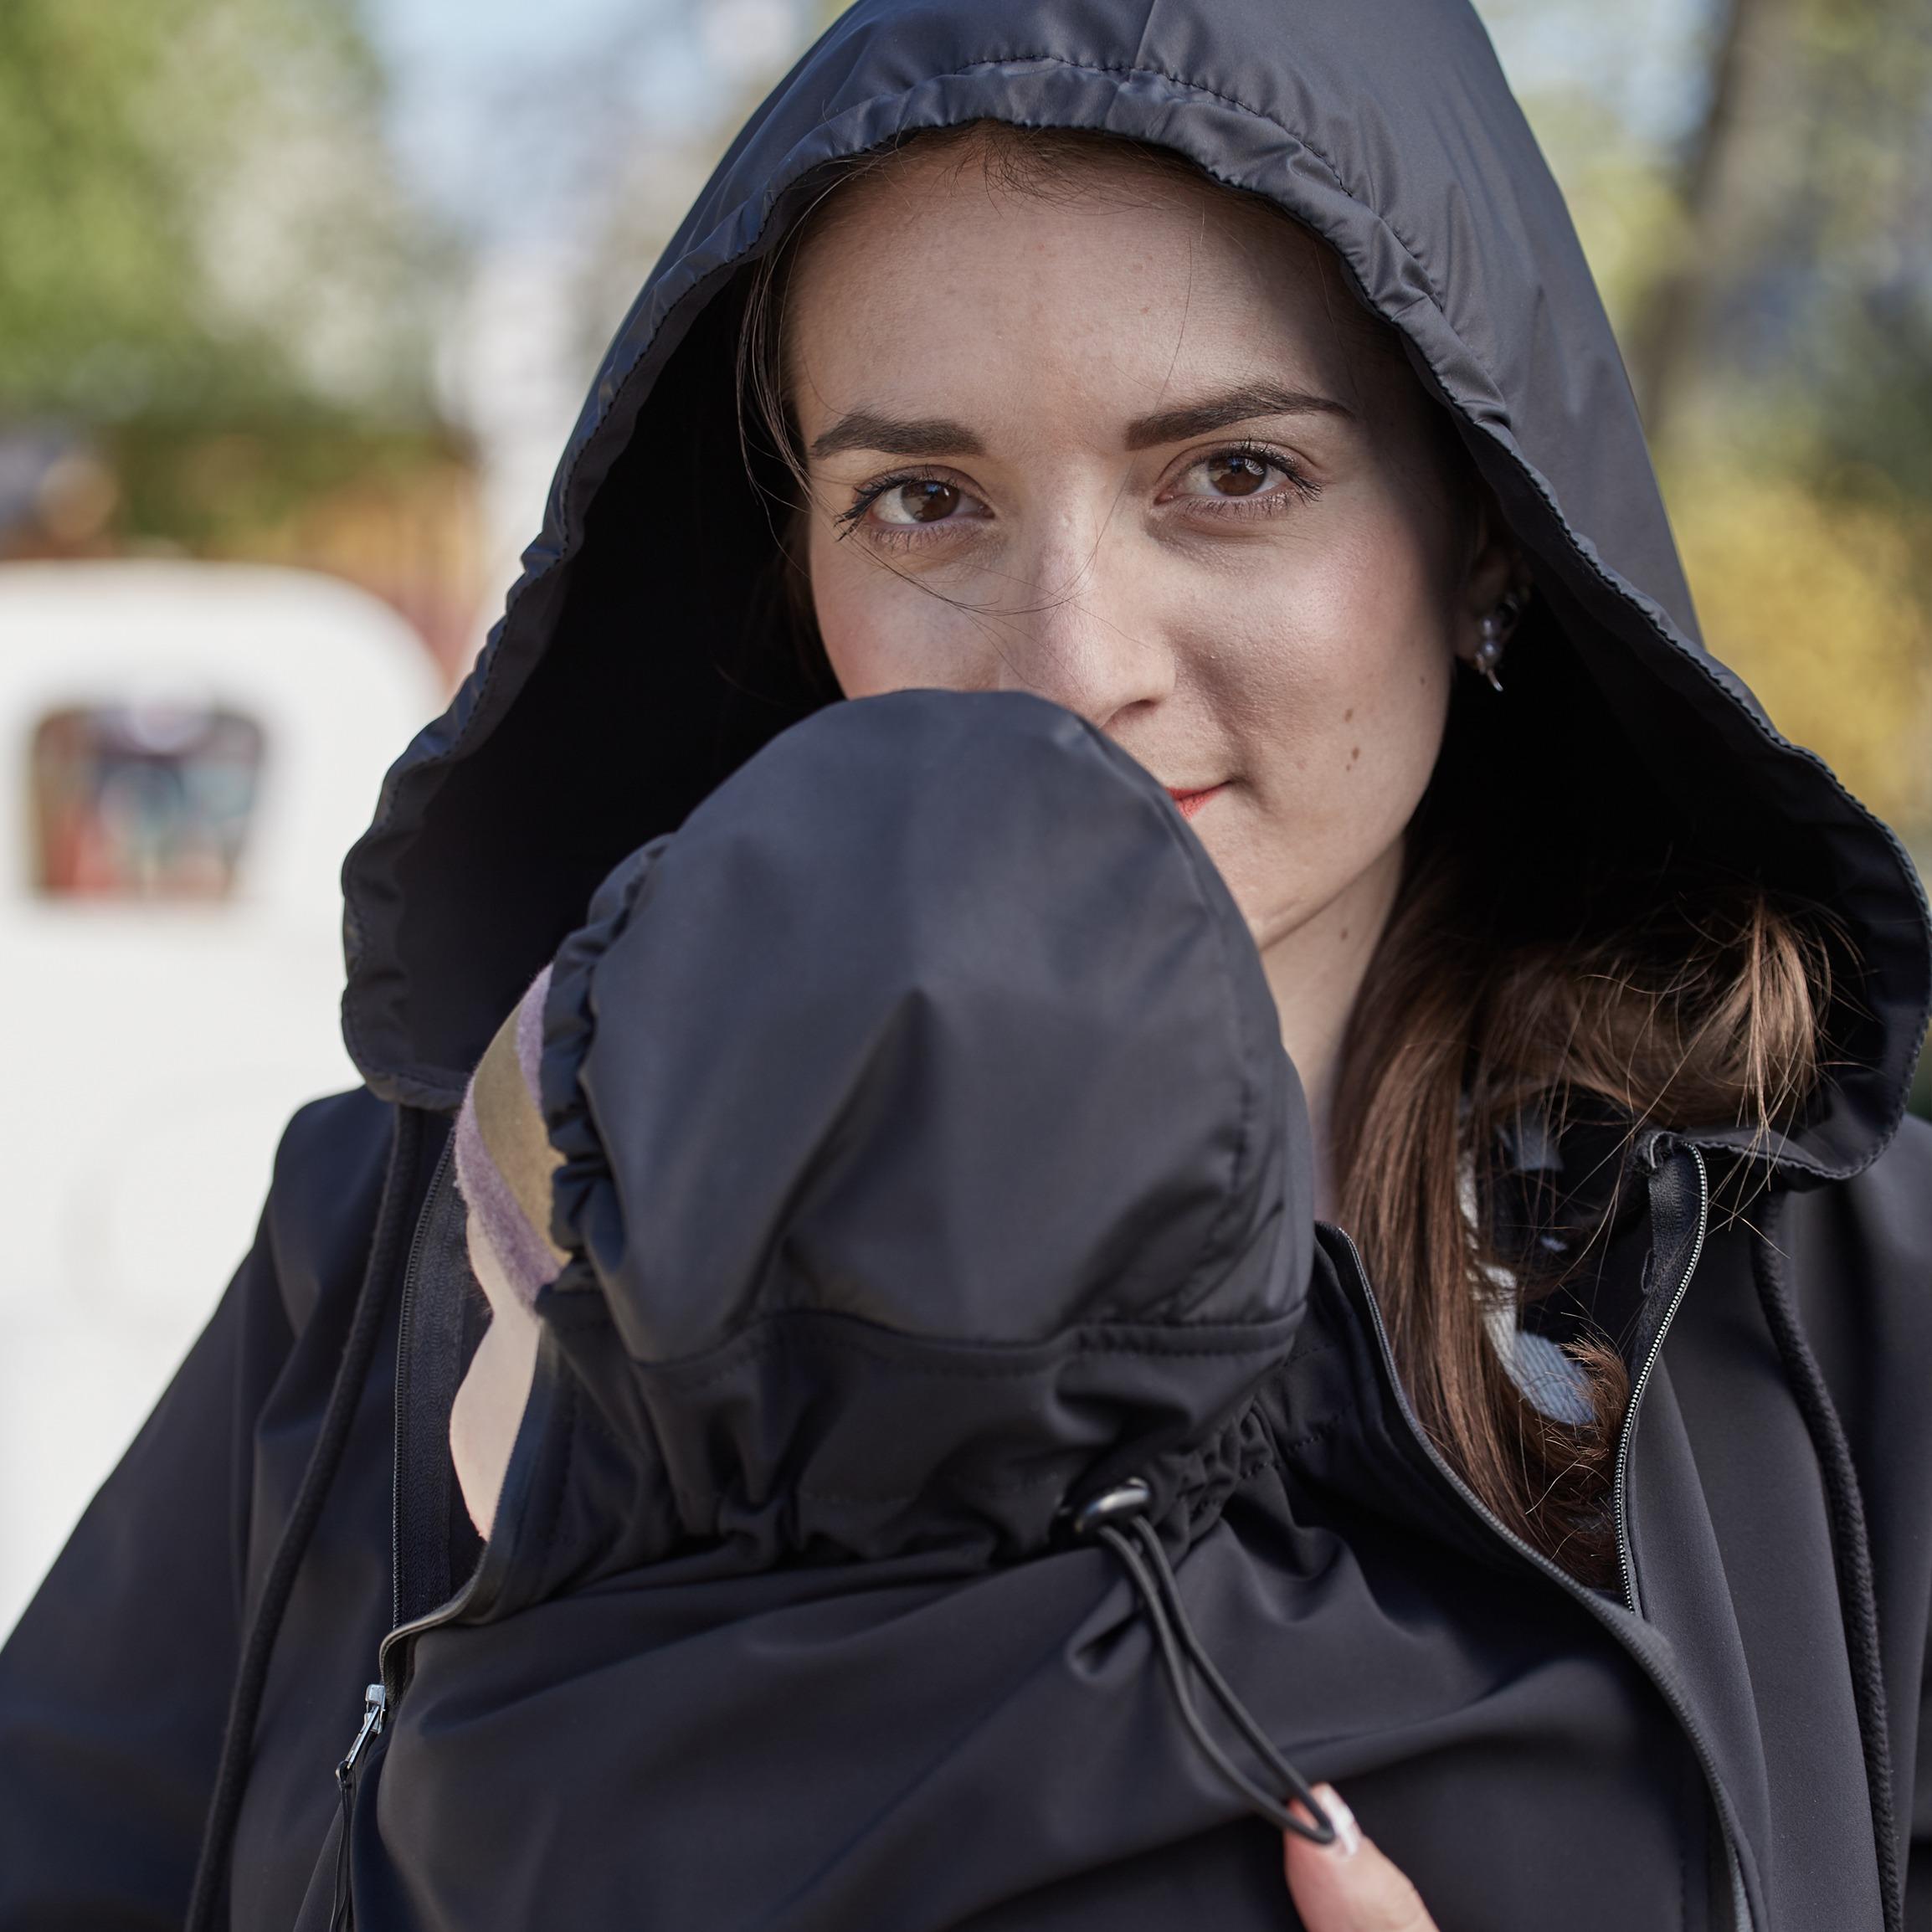 Nepromokava nosici bunda